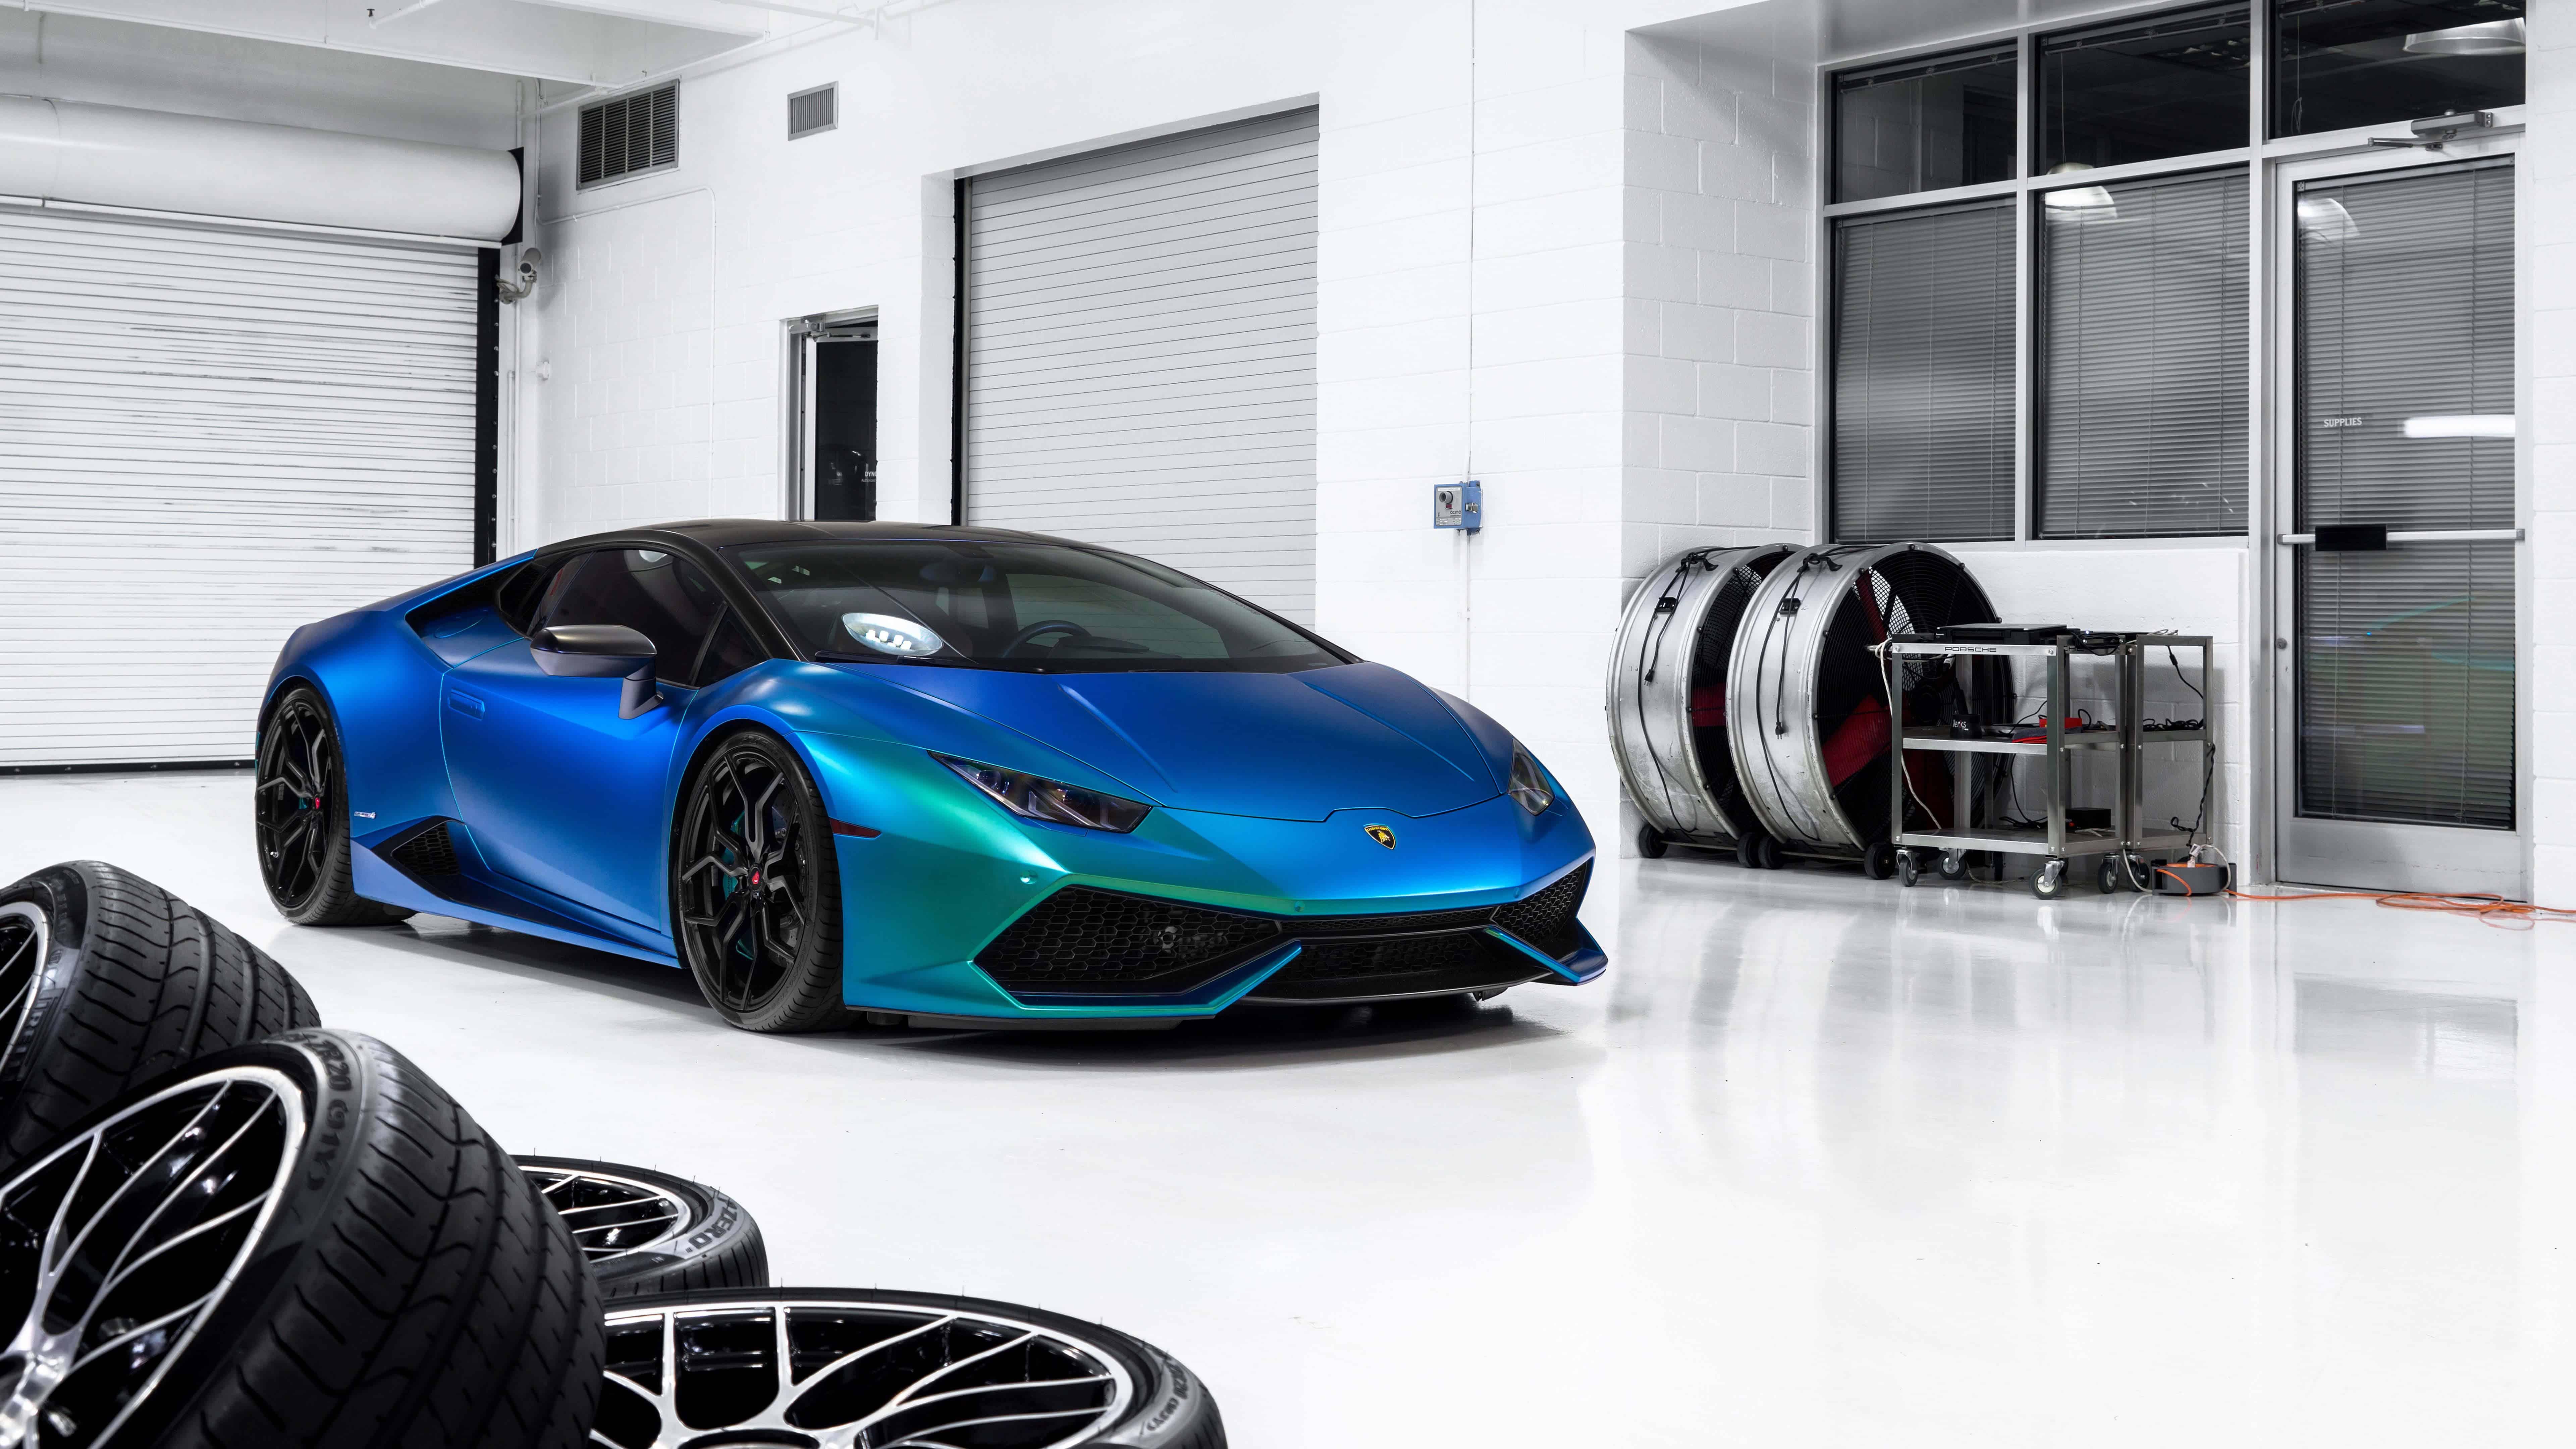 Lamborghini Huracan Blue Uhd 8k Wallpaper Pixelz